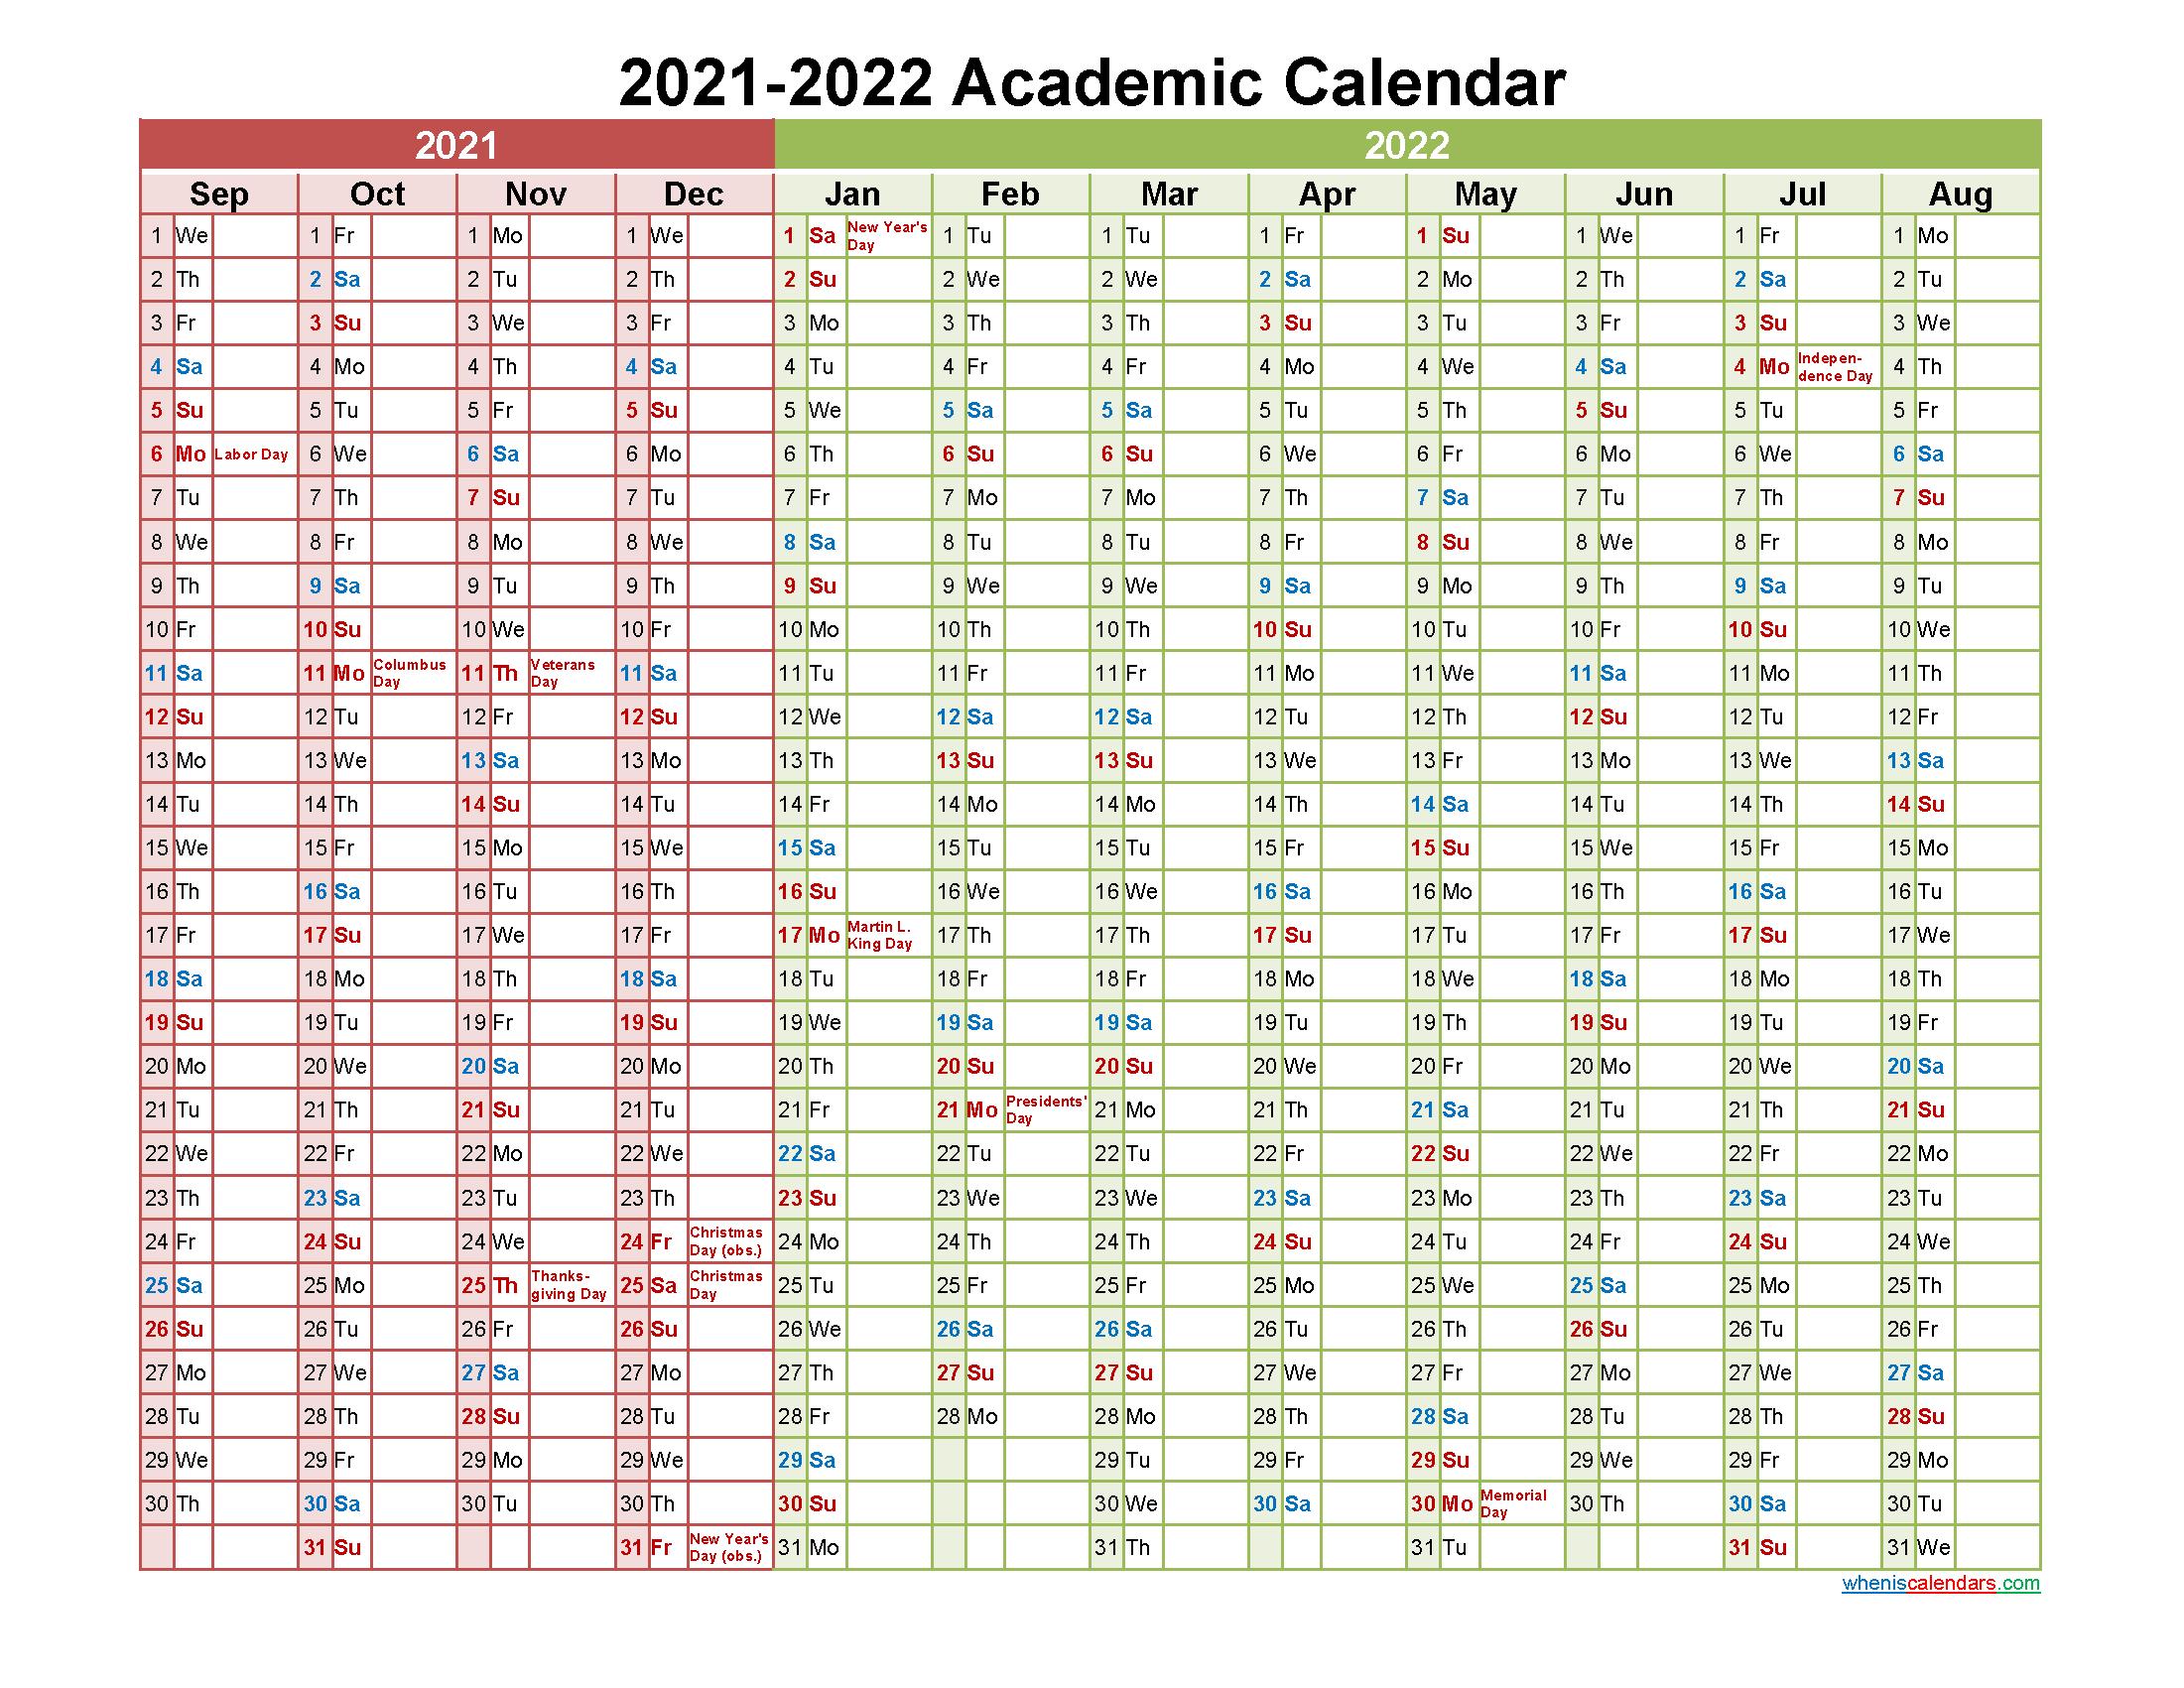 Su Academic Calendar 2022.Academic Calendar 2021 And 2022 Printable Landscape Template No Aca22y16 Free Printable 2021 Monthly Calendar With Holidays